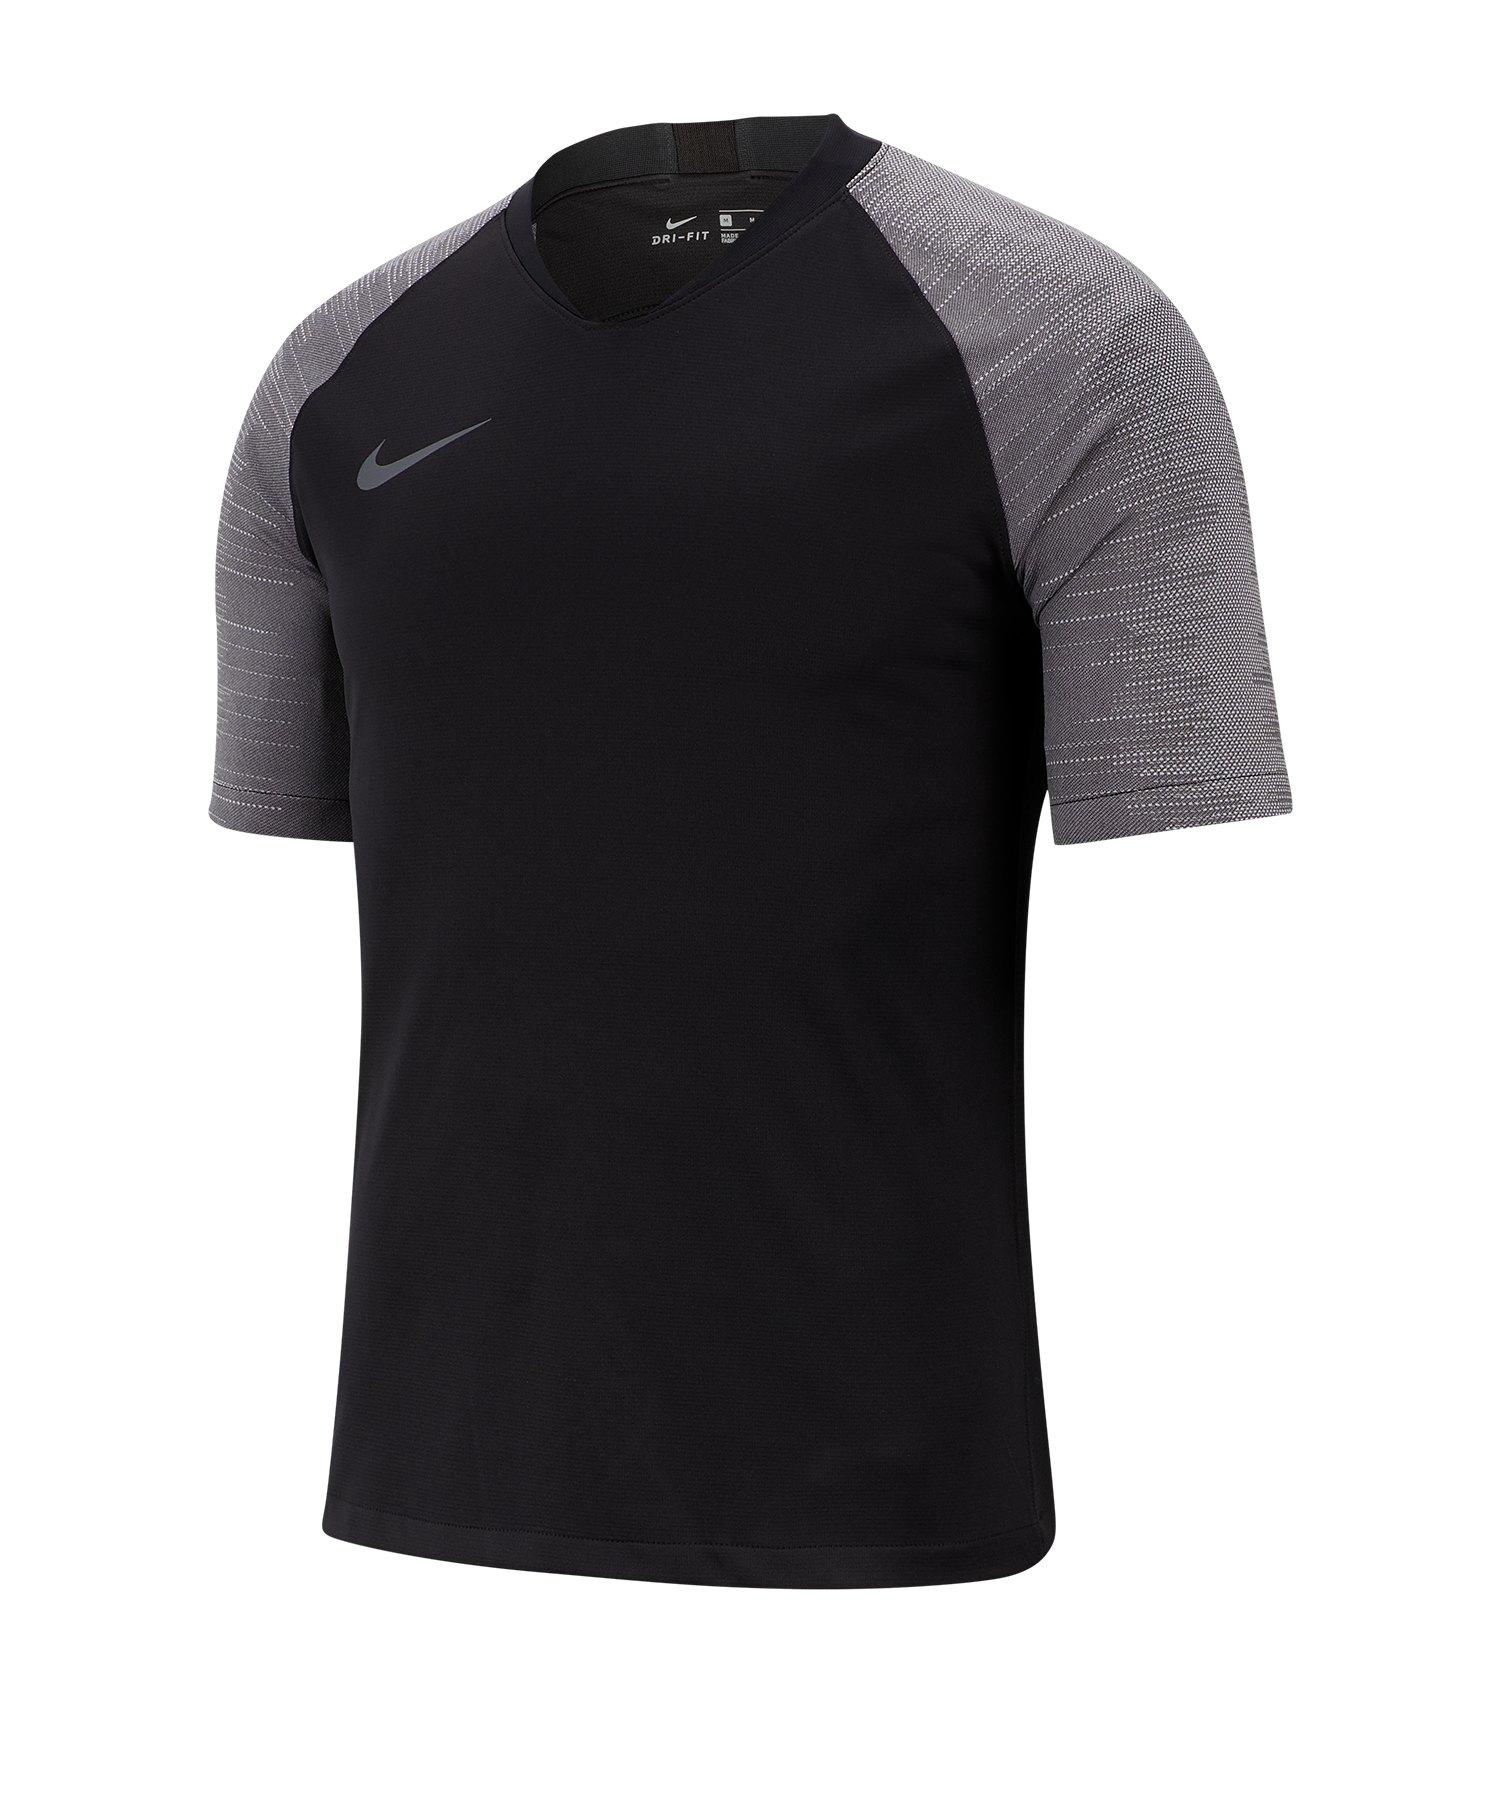 Nike Dri-FIT Breathe Strike Trainingsshirt F010 - schwarz